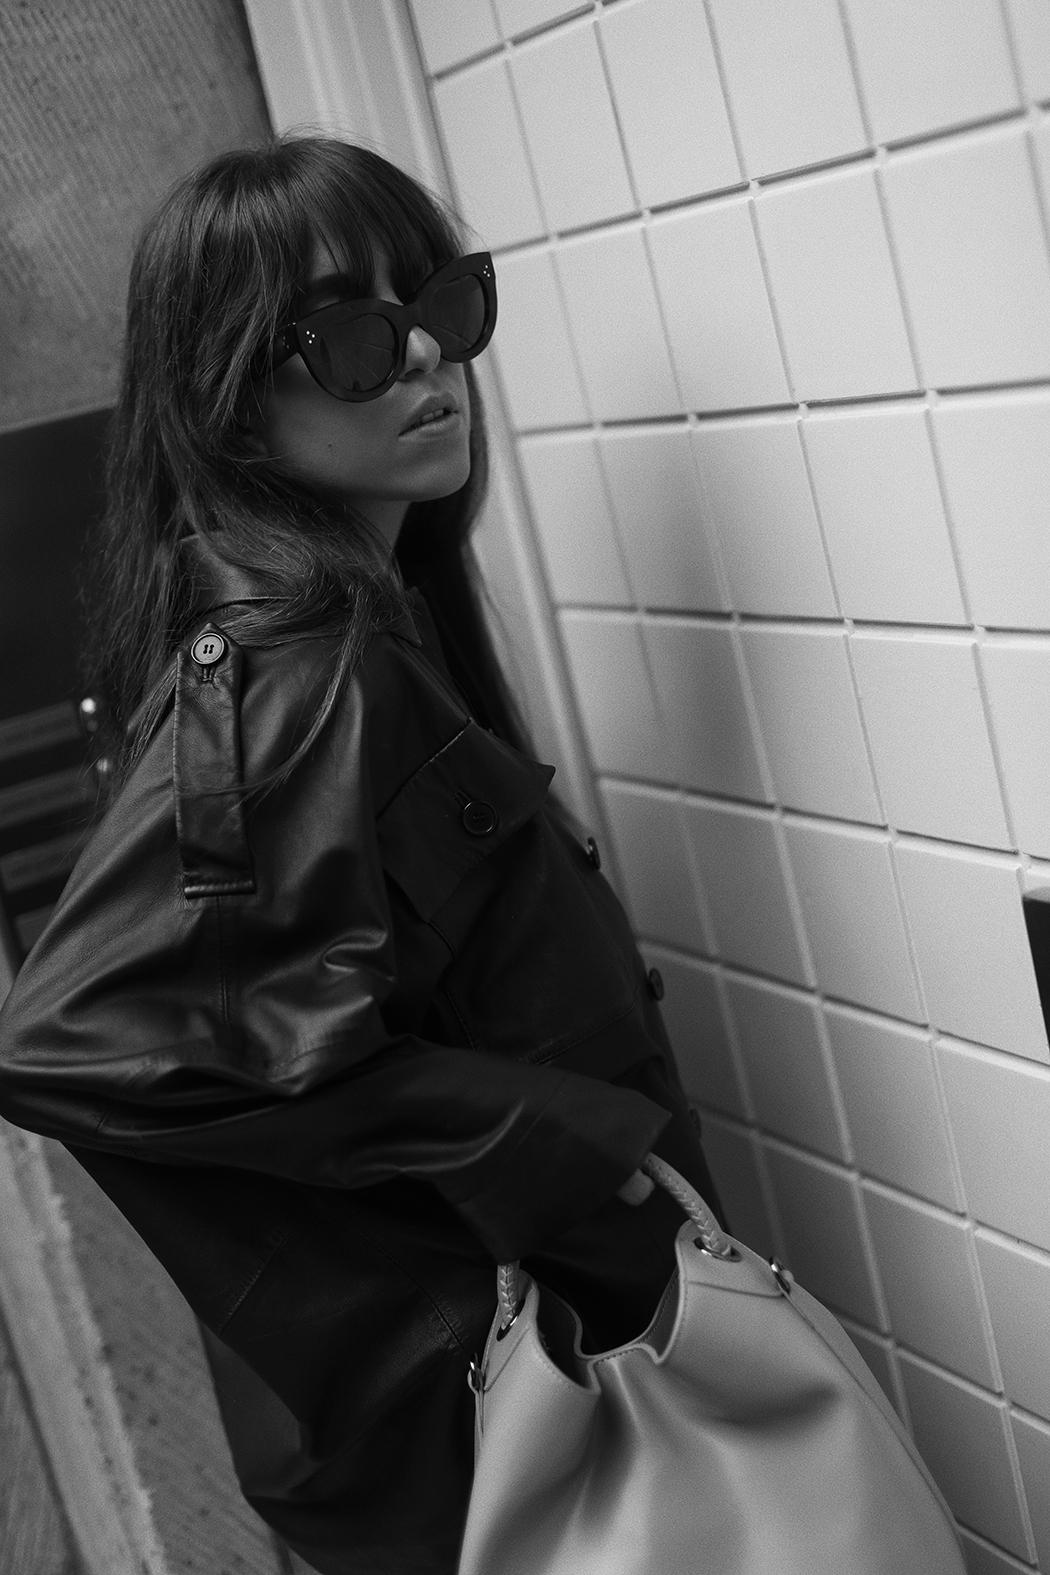 The Dashing Rider Black SET Leather Jacket